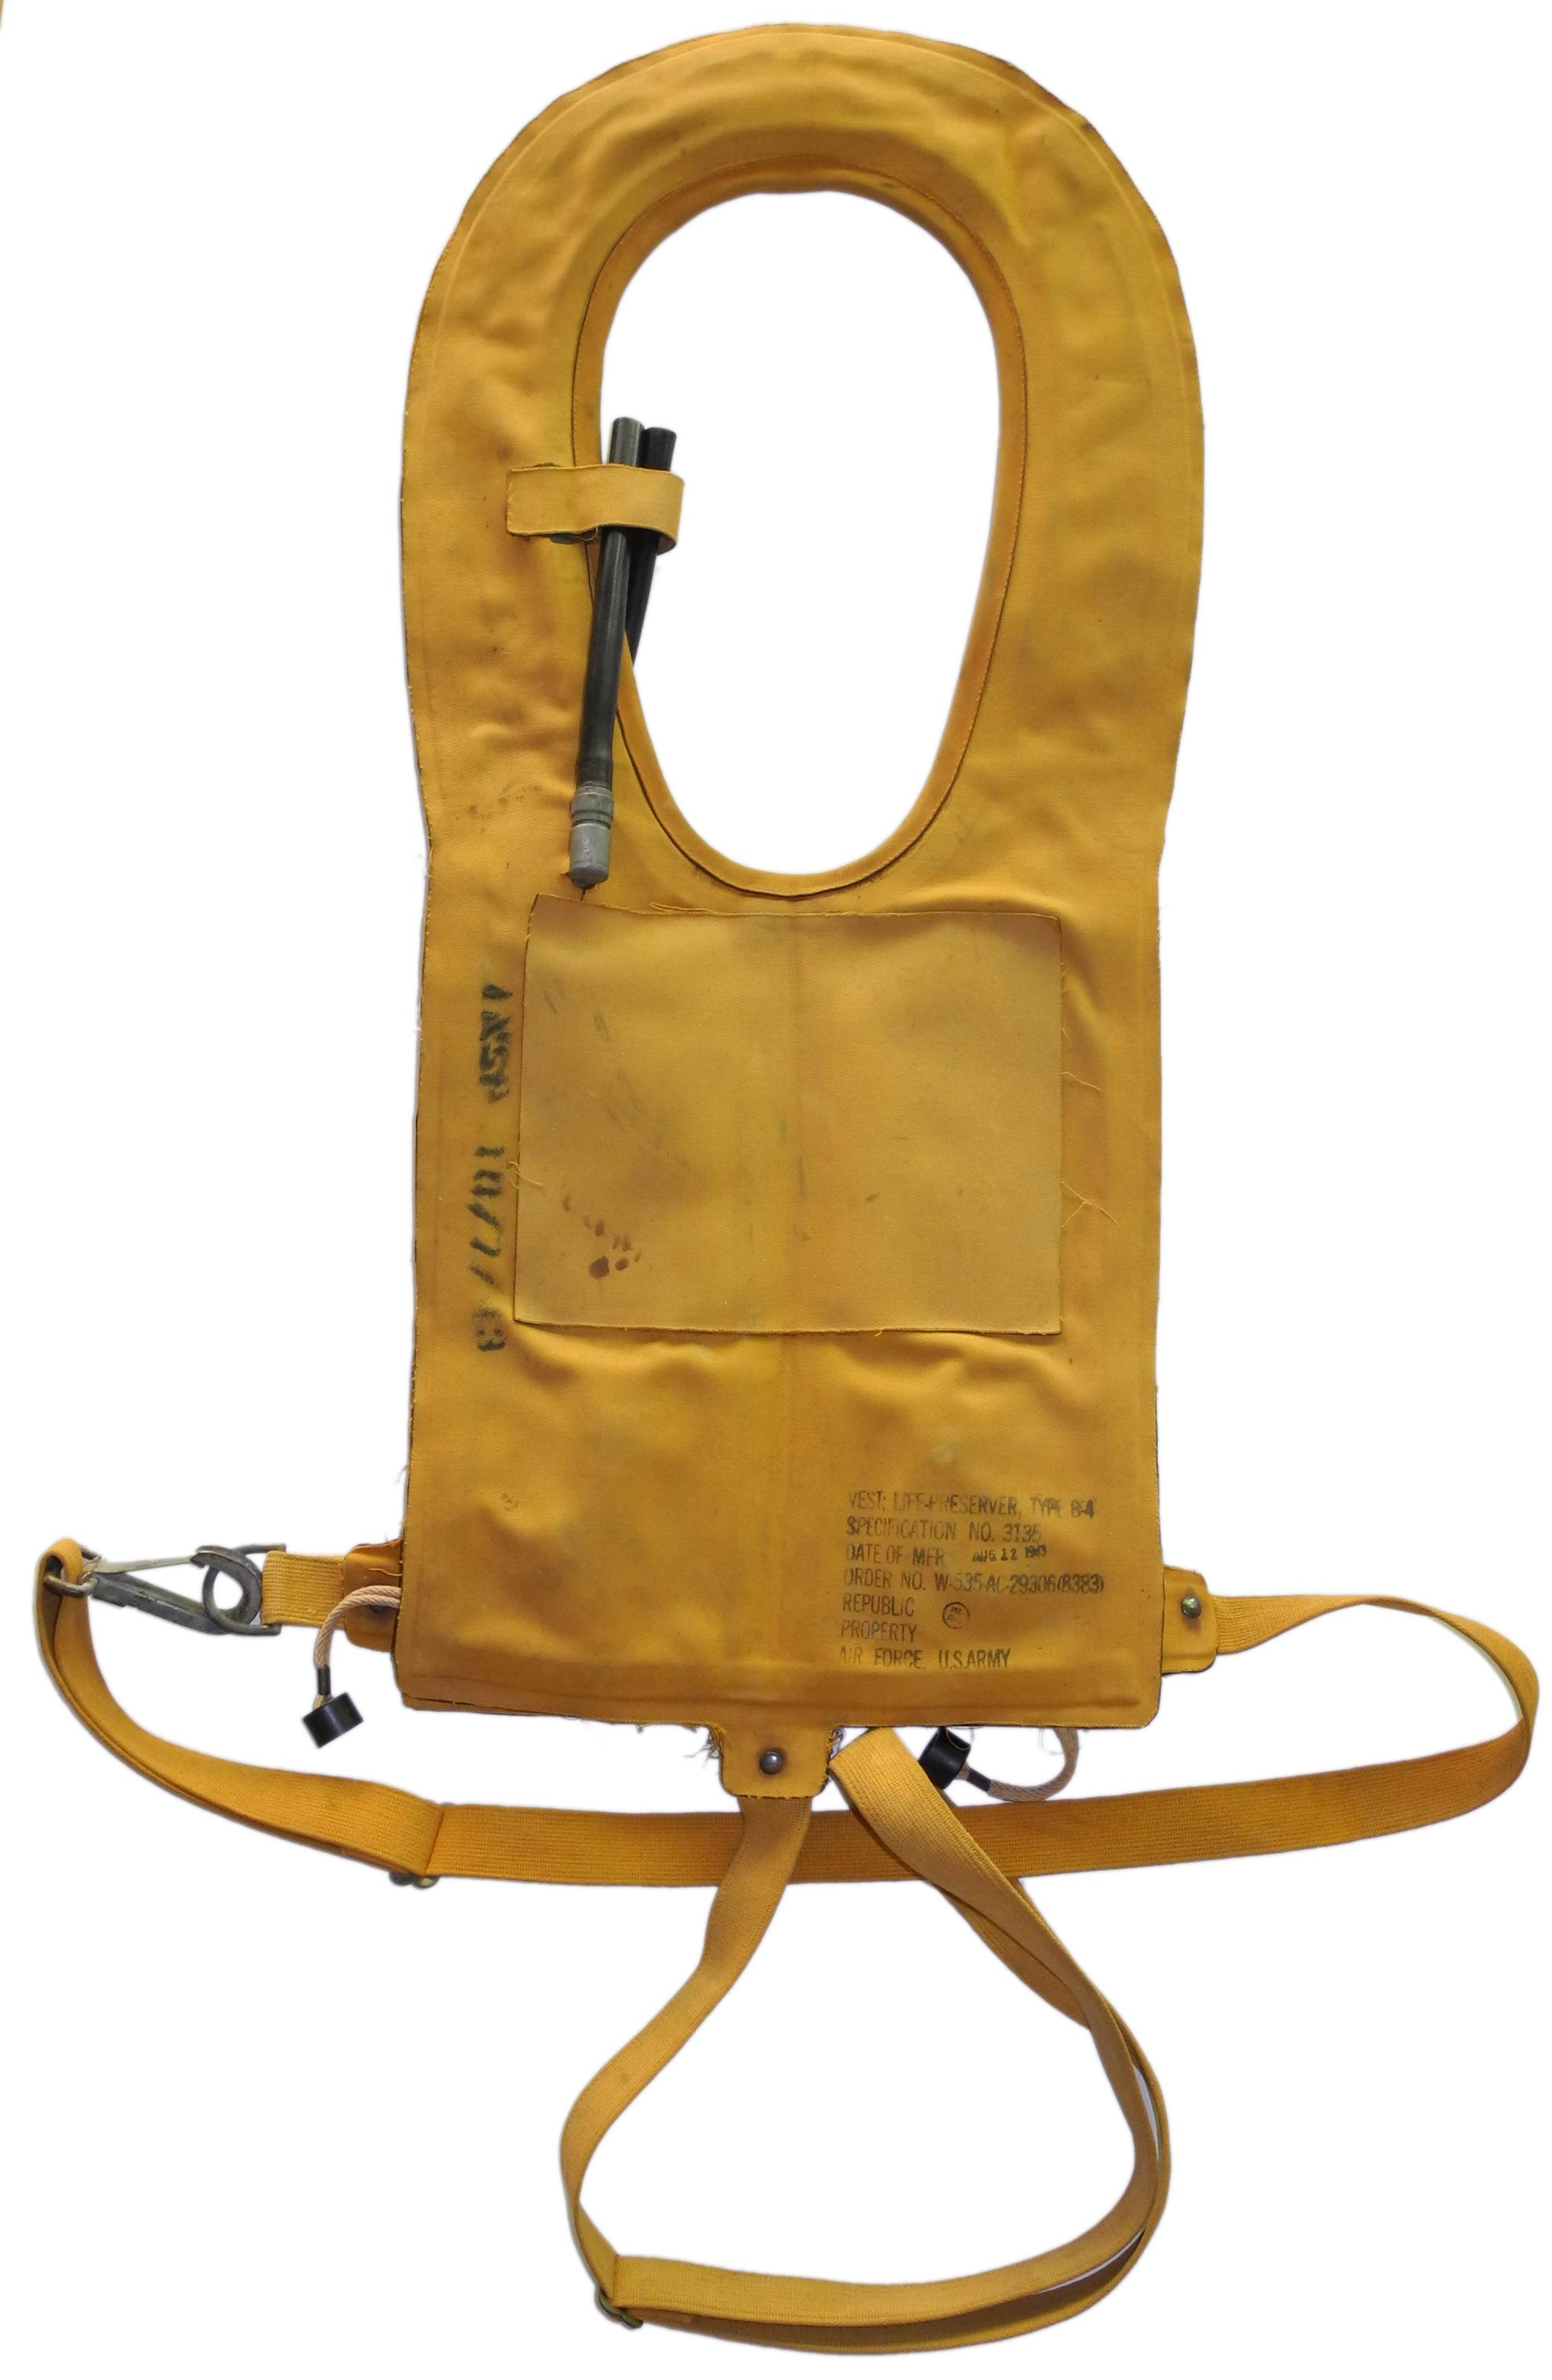 AAF Type B-4 life vest